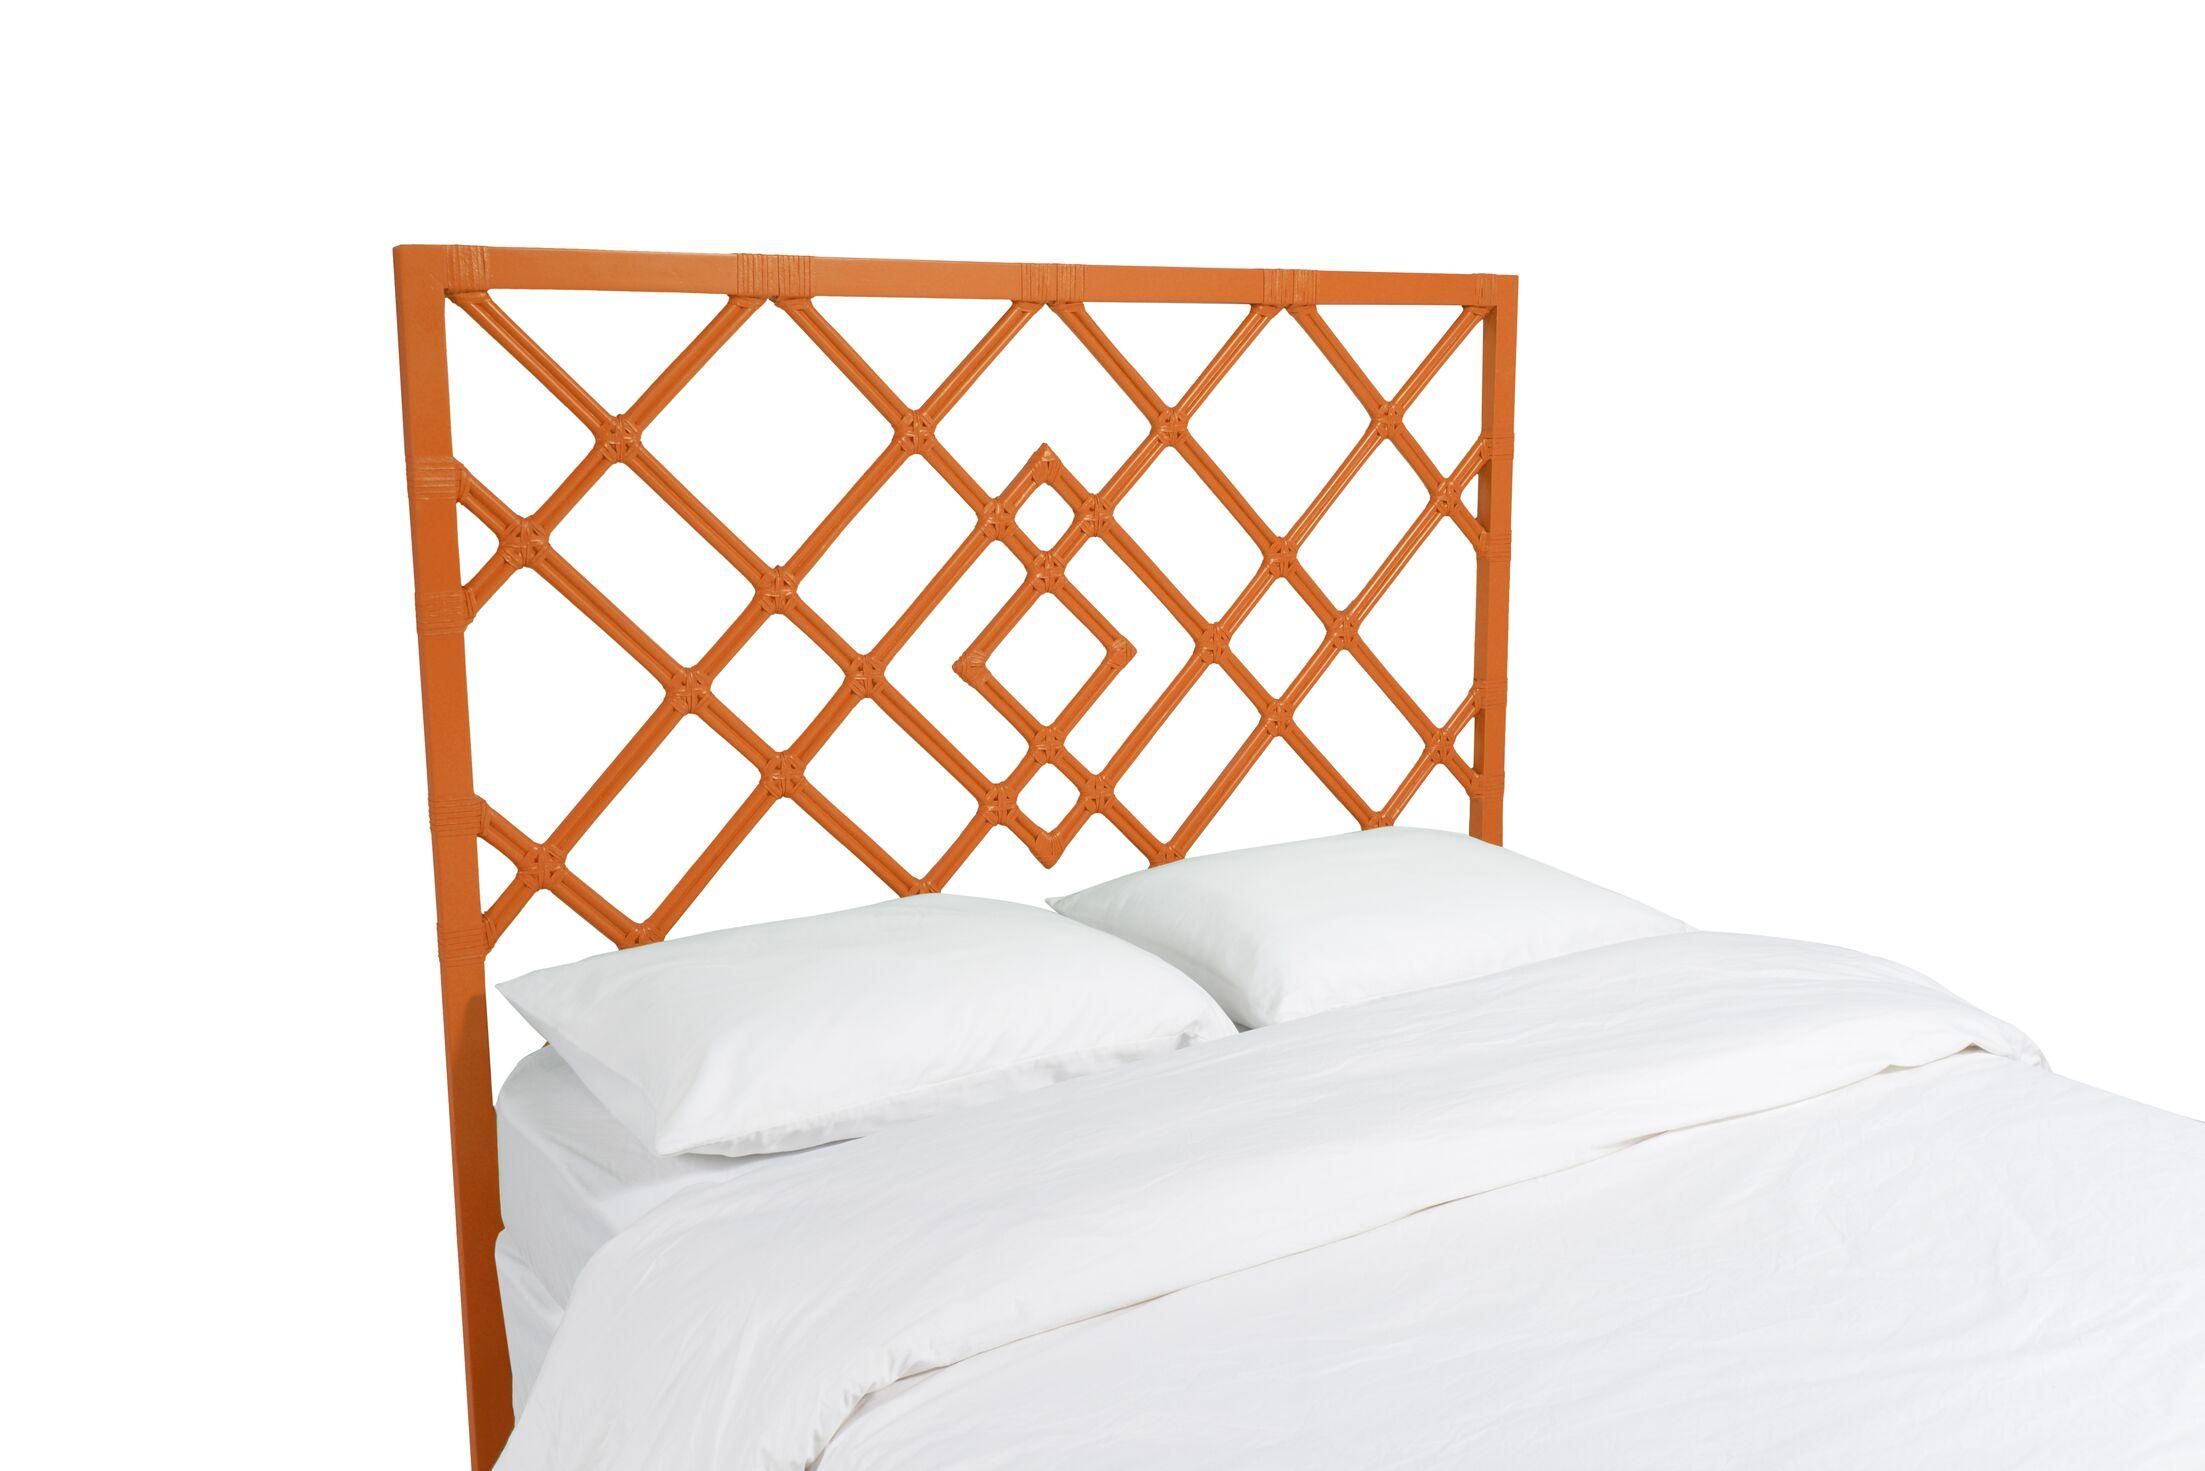 Darien Open Frame Headboard Color: Citrus Orange, Size: Twin